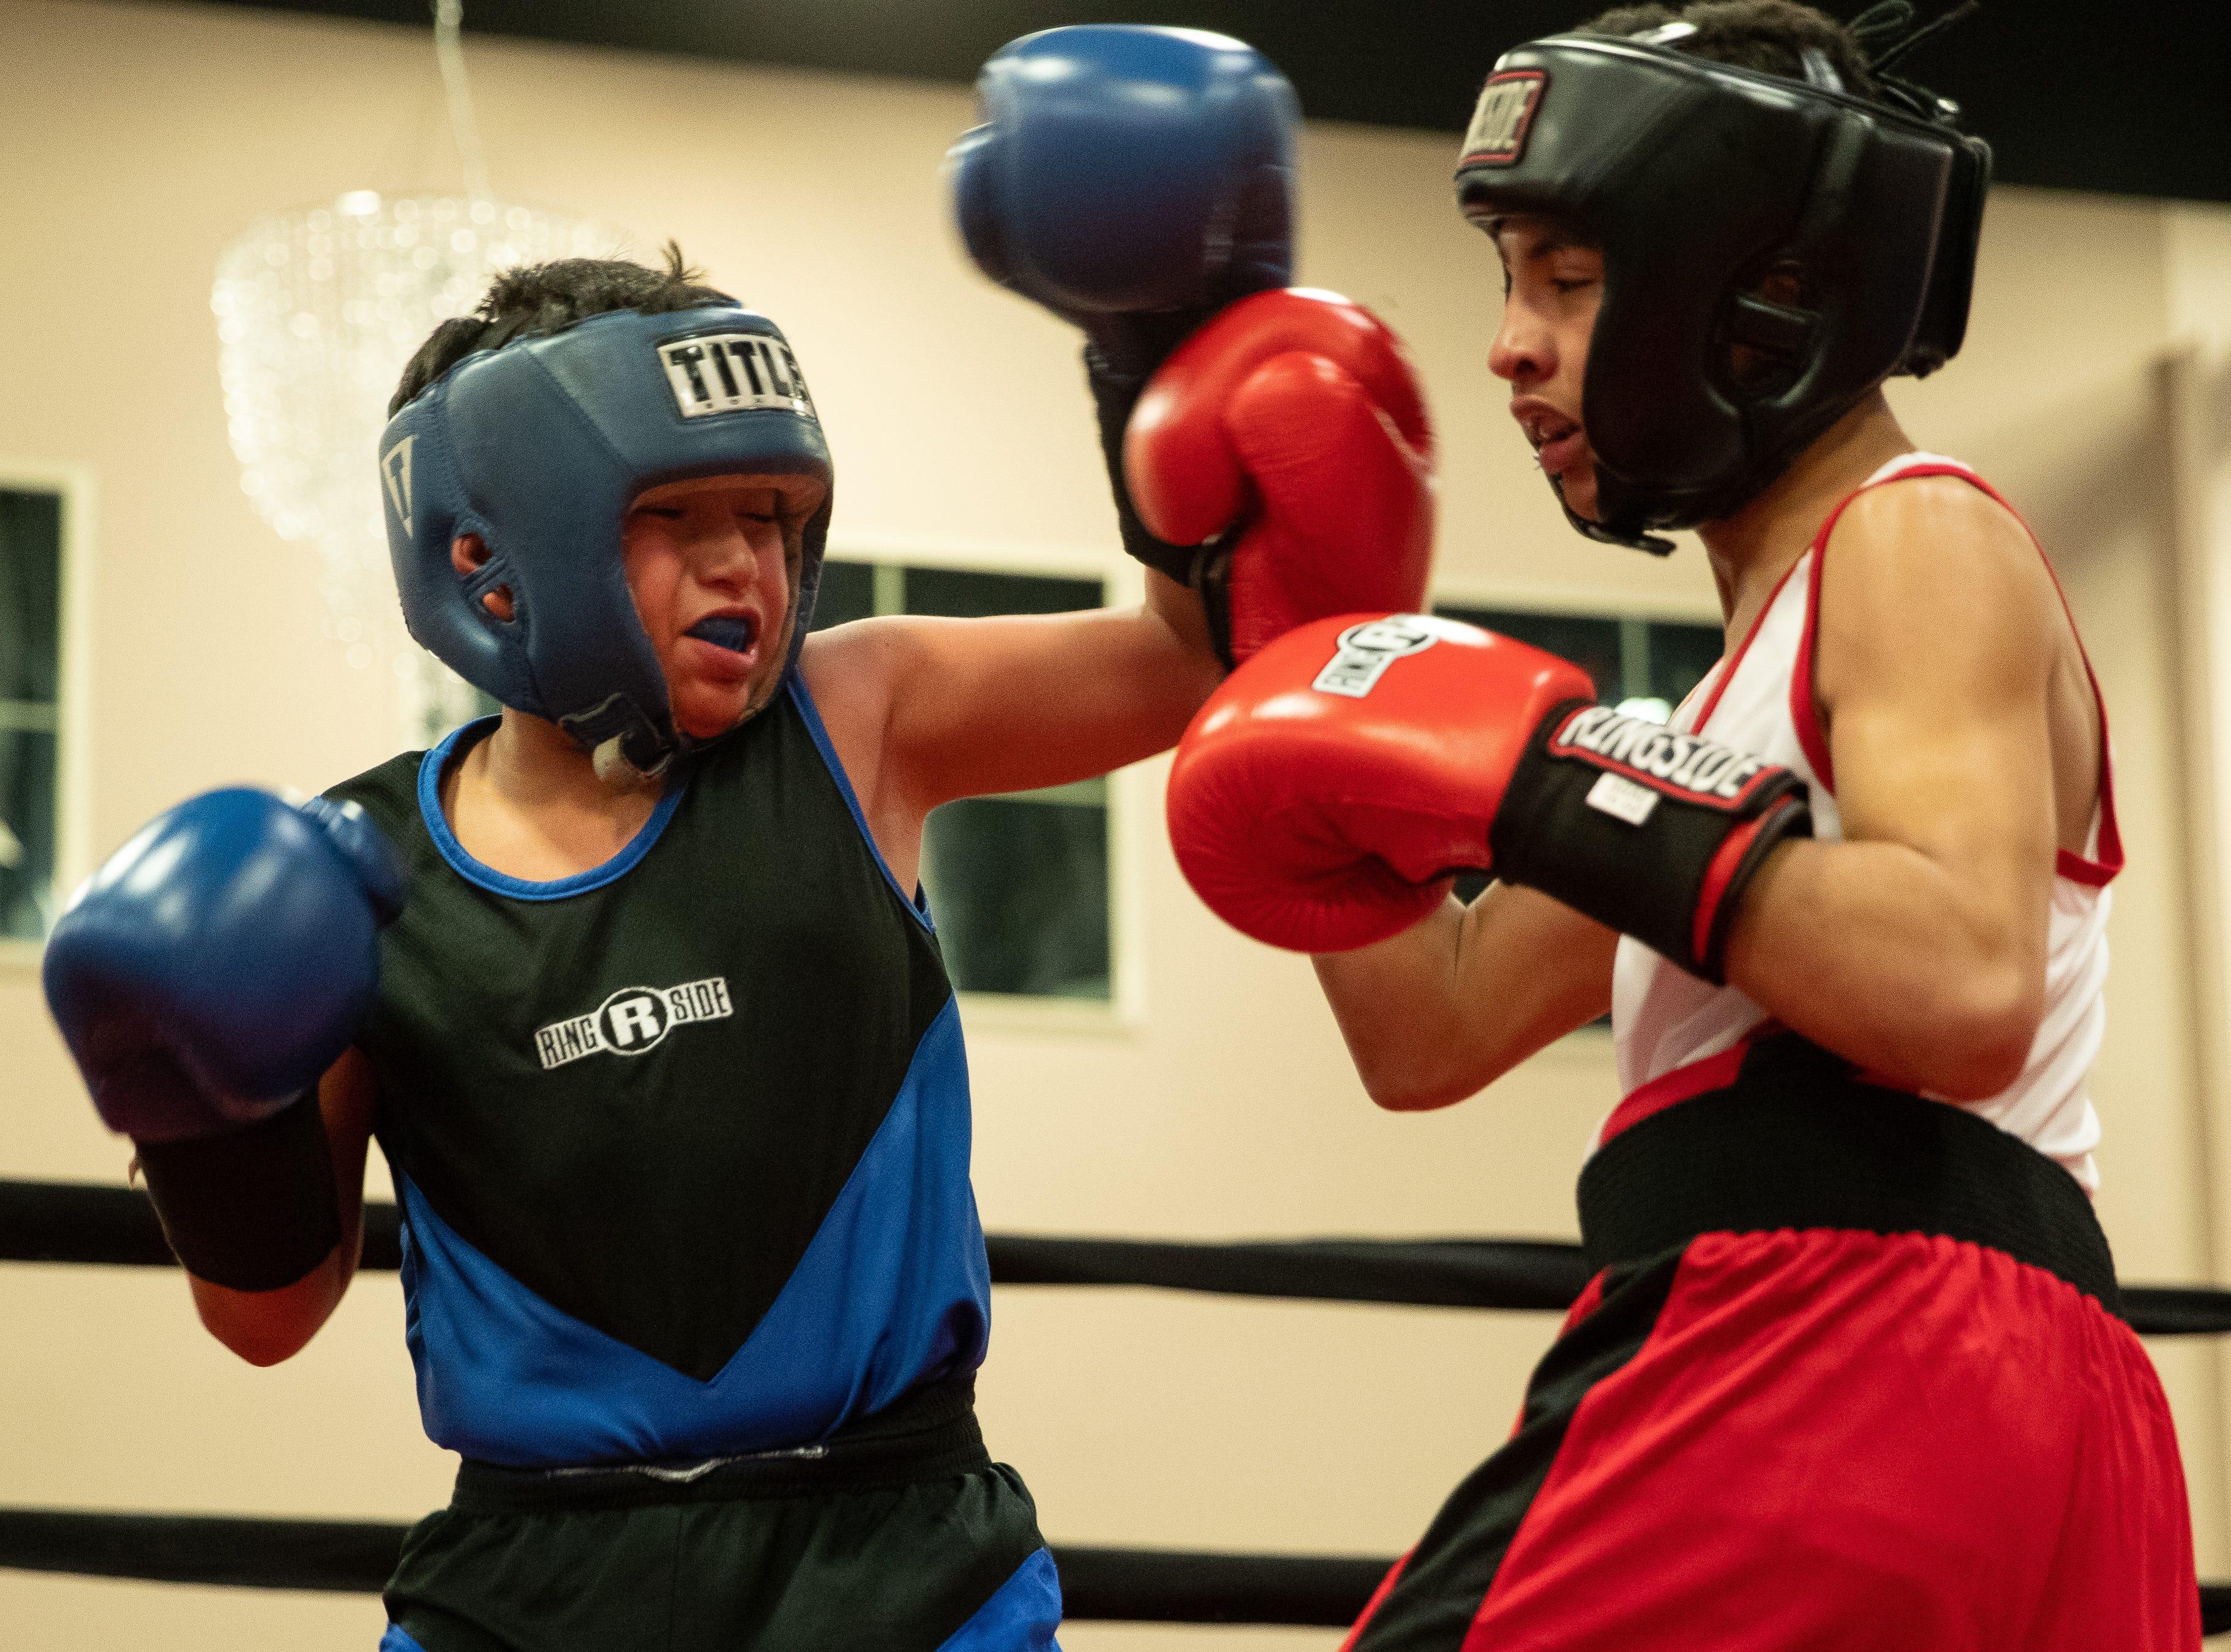 Daniel Perez fights Delan Cuevas during the regional golden gloves tournament at the Valencia on Saturday, Feb. 9, 2019.